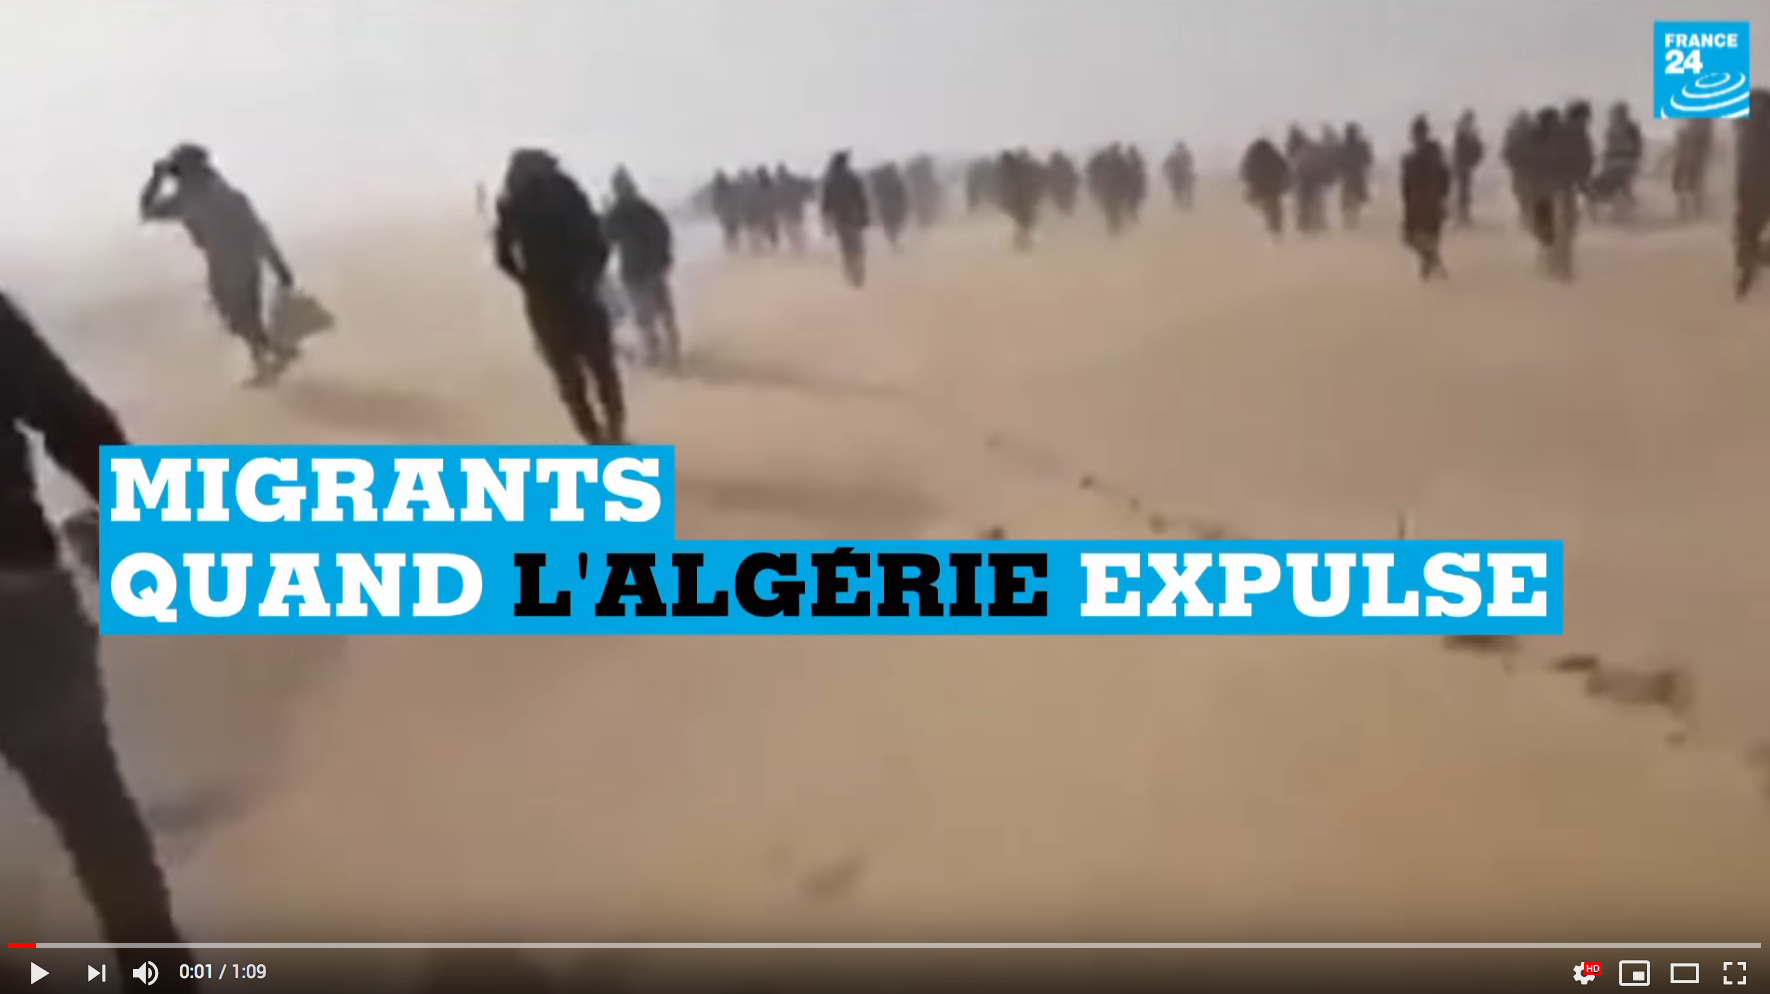 Clandestins : quand l'Algérie expulse (VIDÉO)